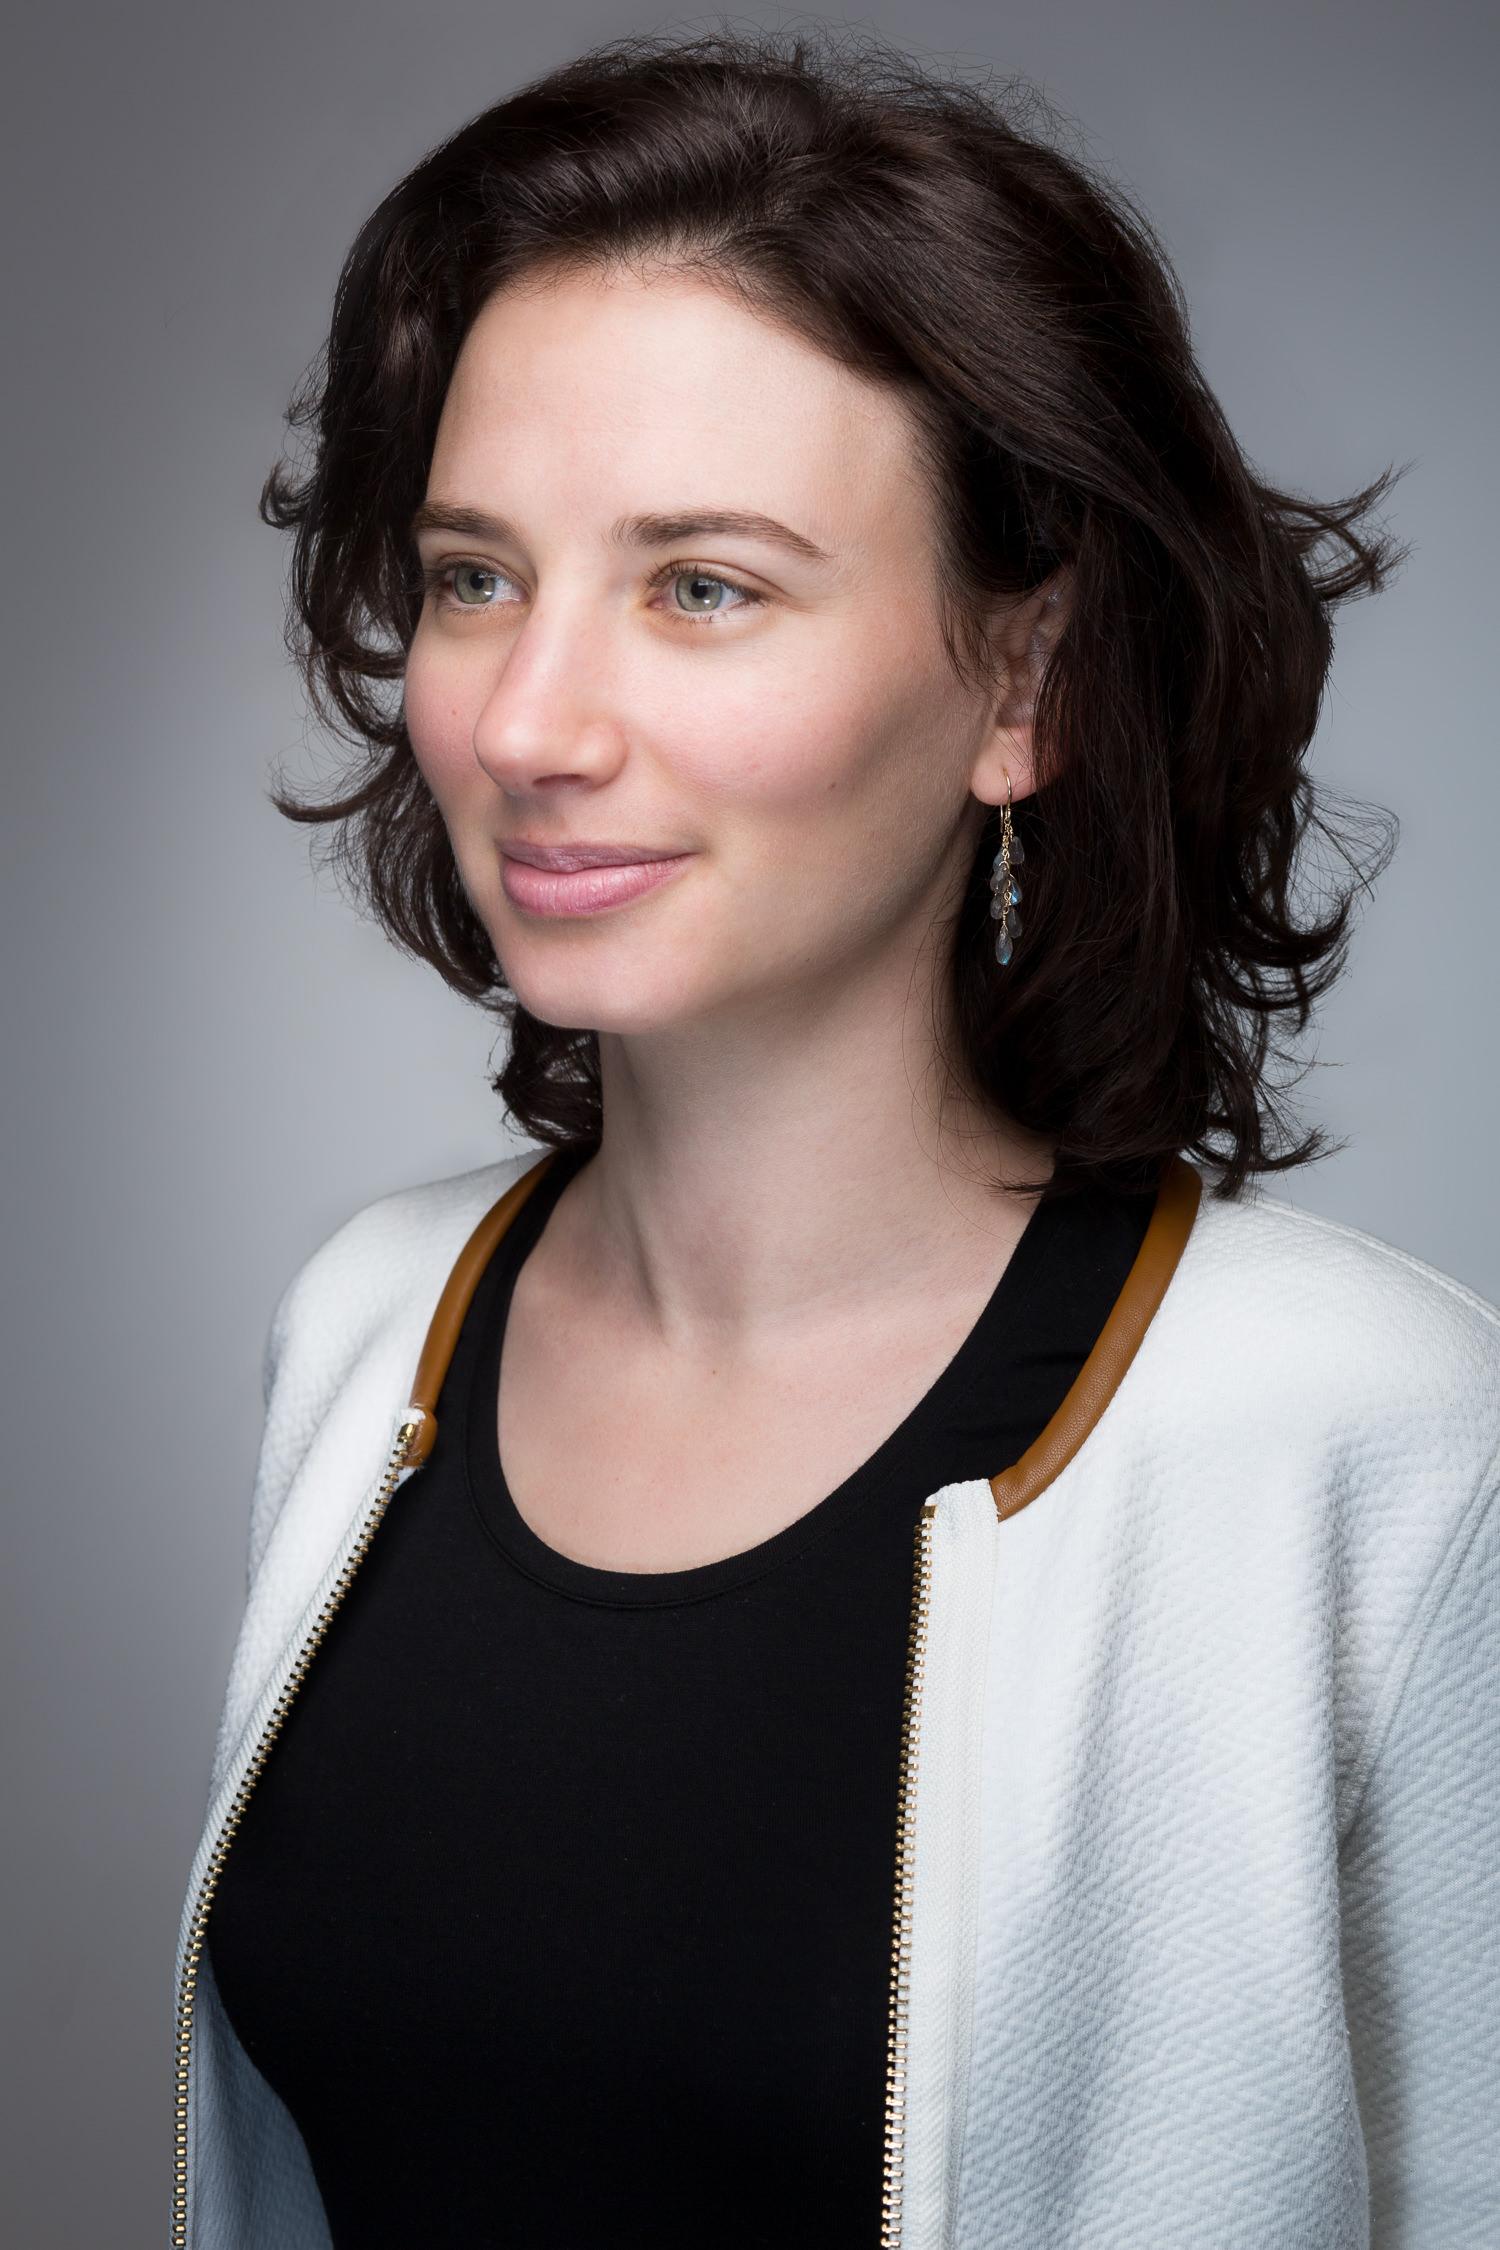 amsterdam-headshot-portrait-portret-bedrijf-zakelijk-mark-hadden-photographer-fotograaf-099.jpg